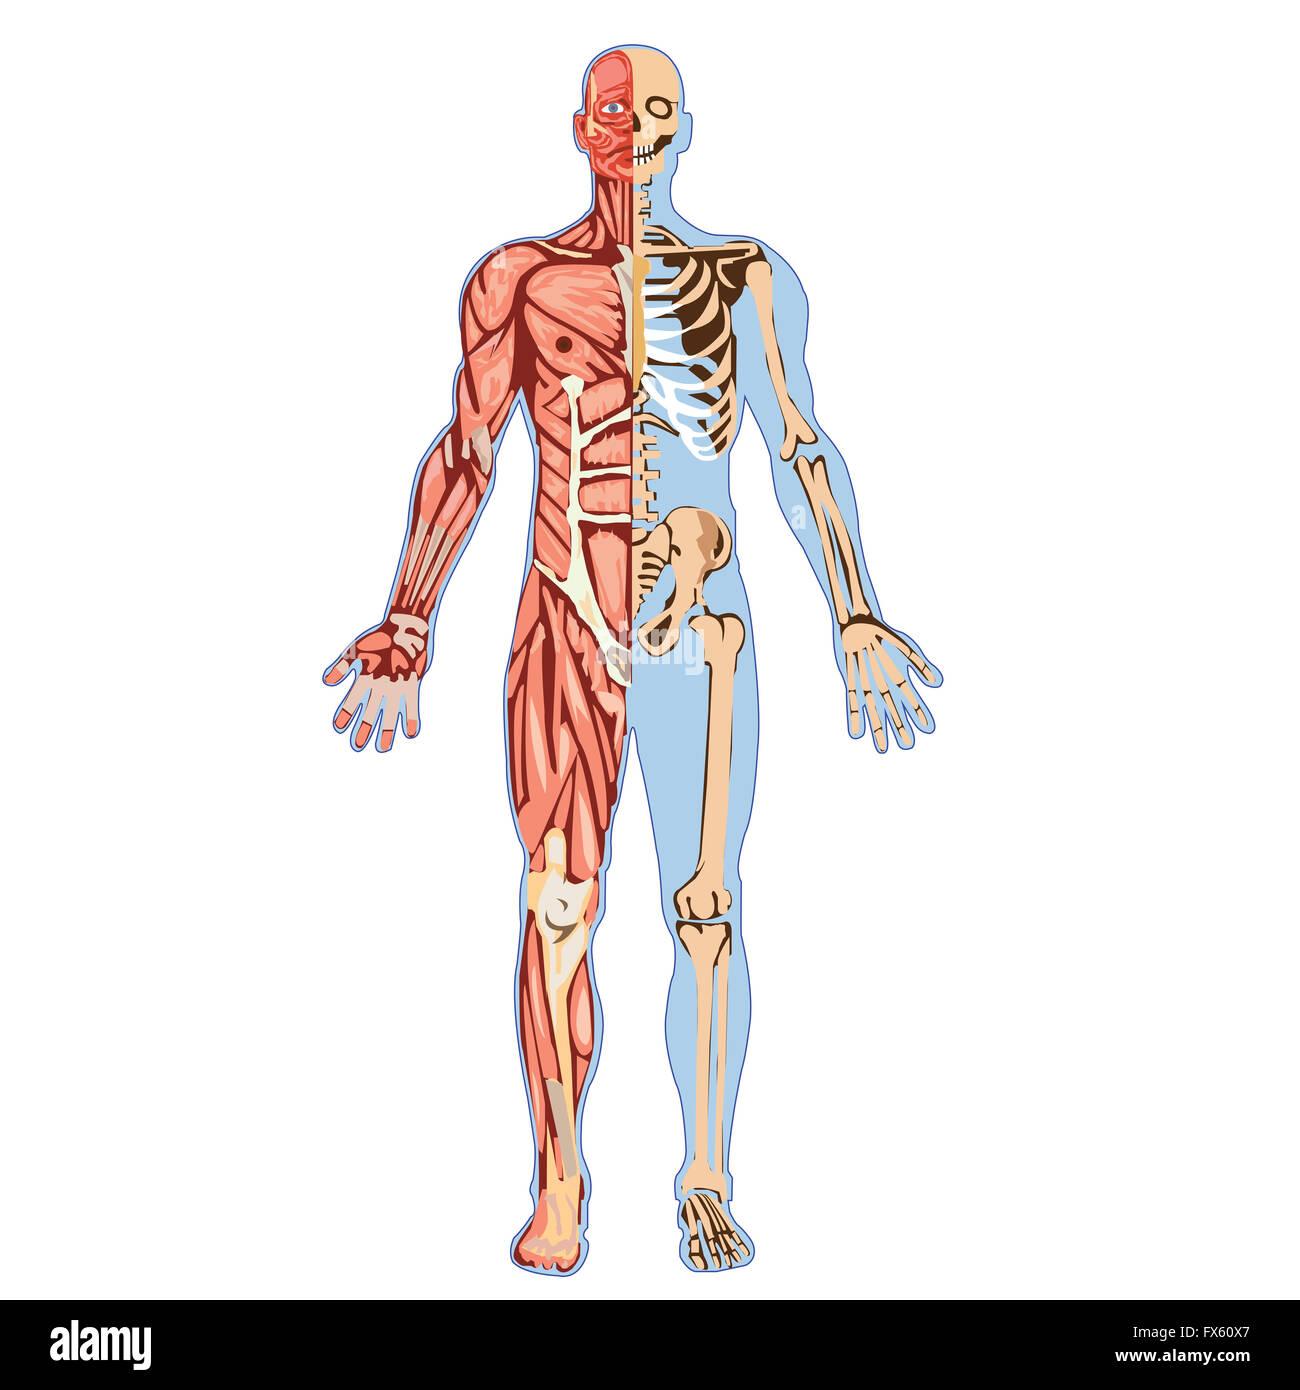 Berühmt Anatomie Lernen 3d Atlas Bilder - Anatomie Ideen - finotti.info